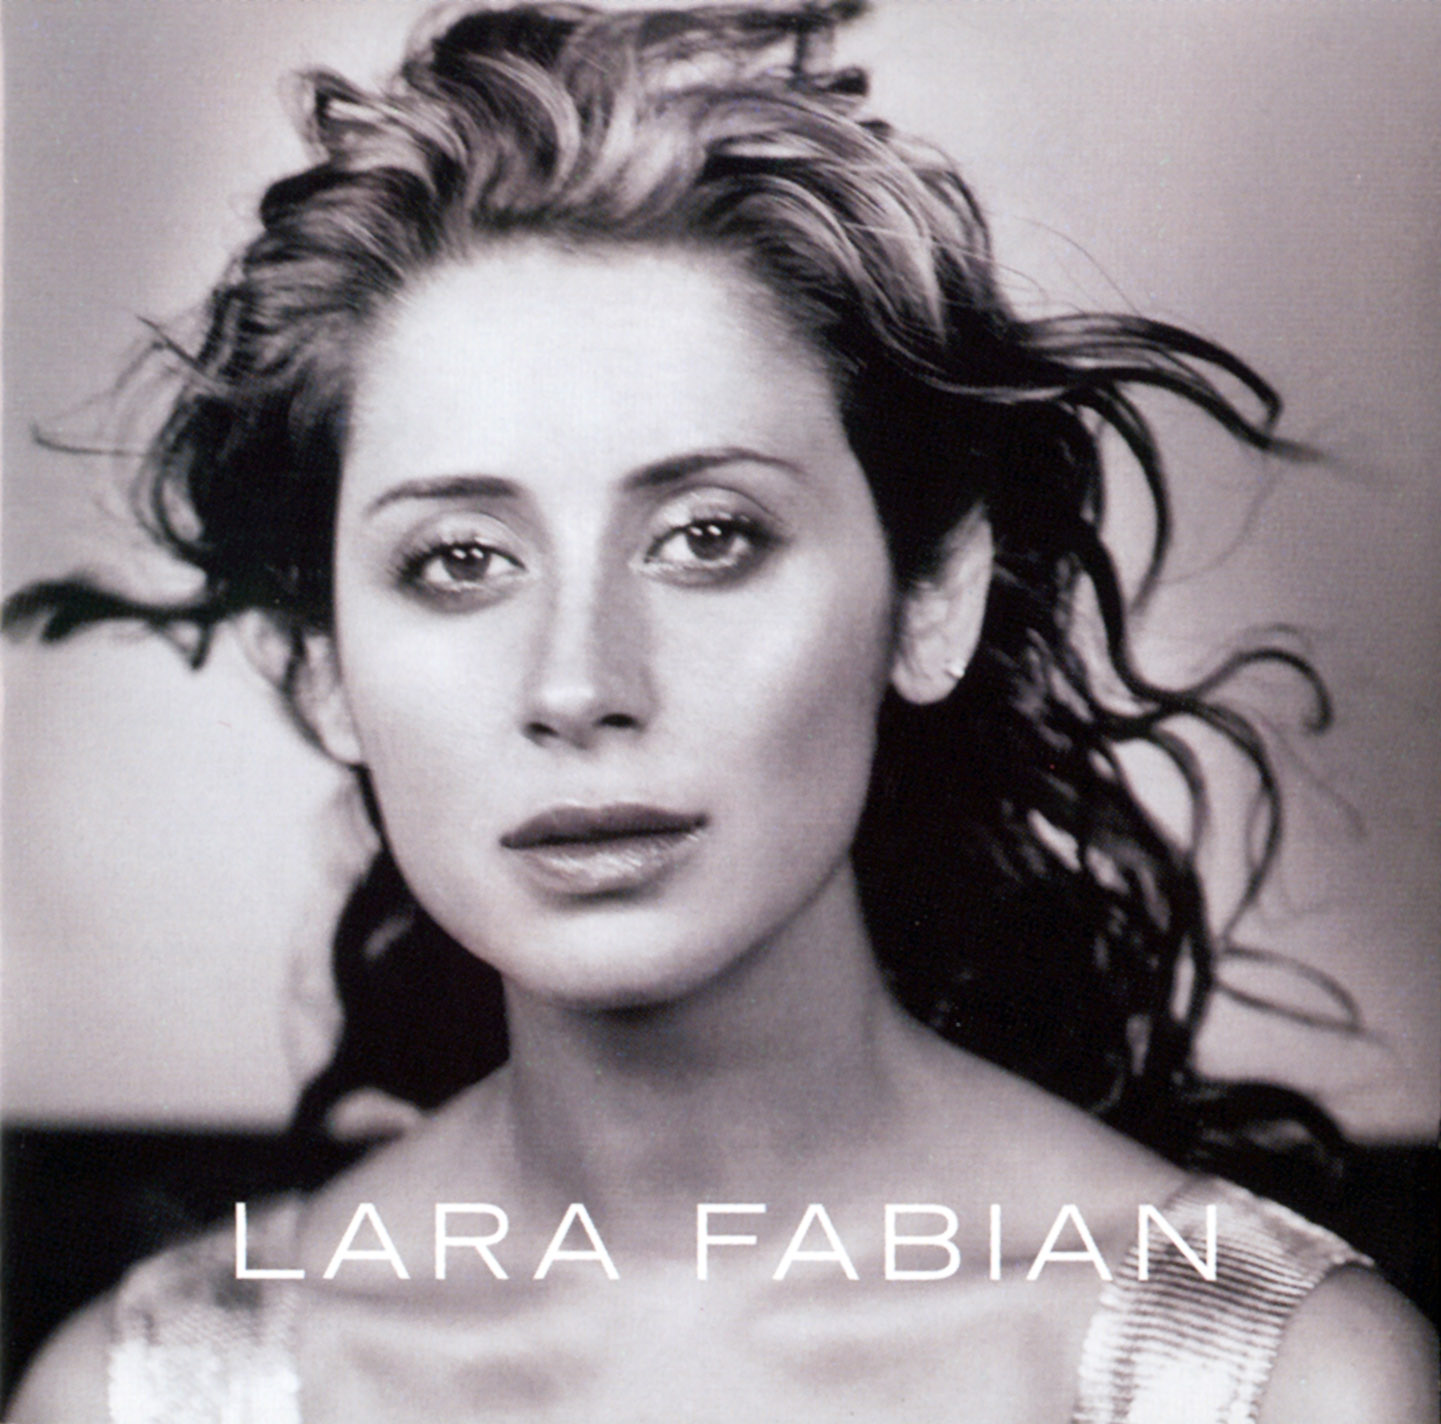 http://1.bp.blogspot.com/-jxCkWUYfgYg/TZhOiSTx0AI/AAAAAAAAeqs/CXyAStI_x_s/s1600/Lara_Fabian--Frontal.jpg